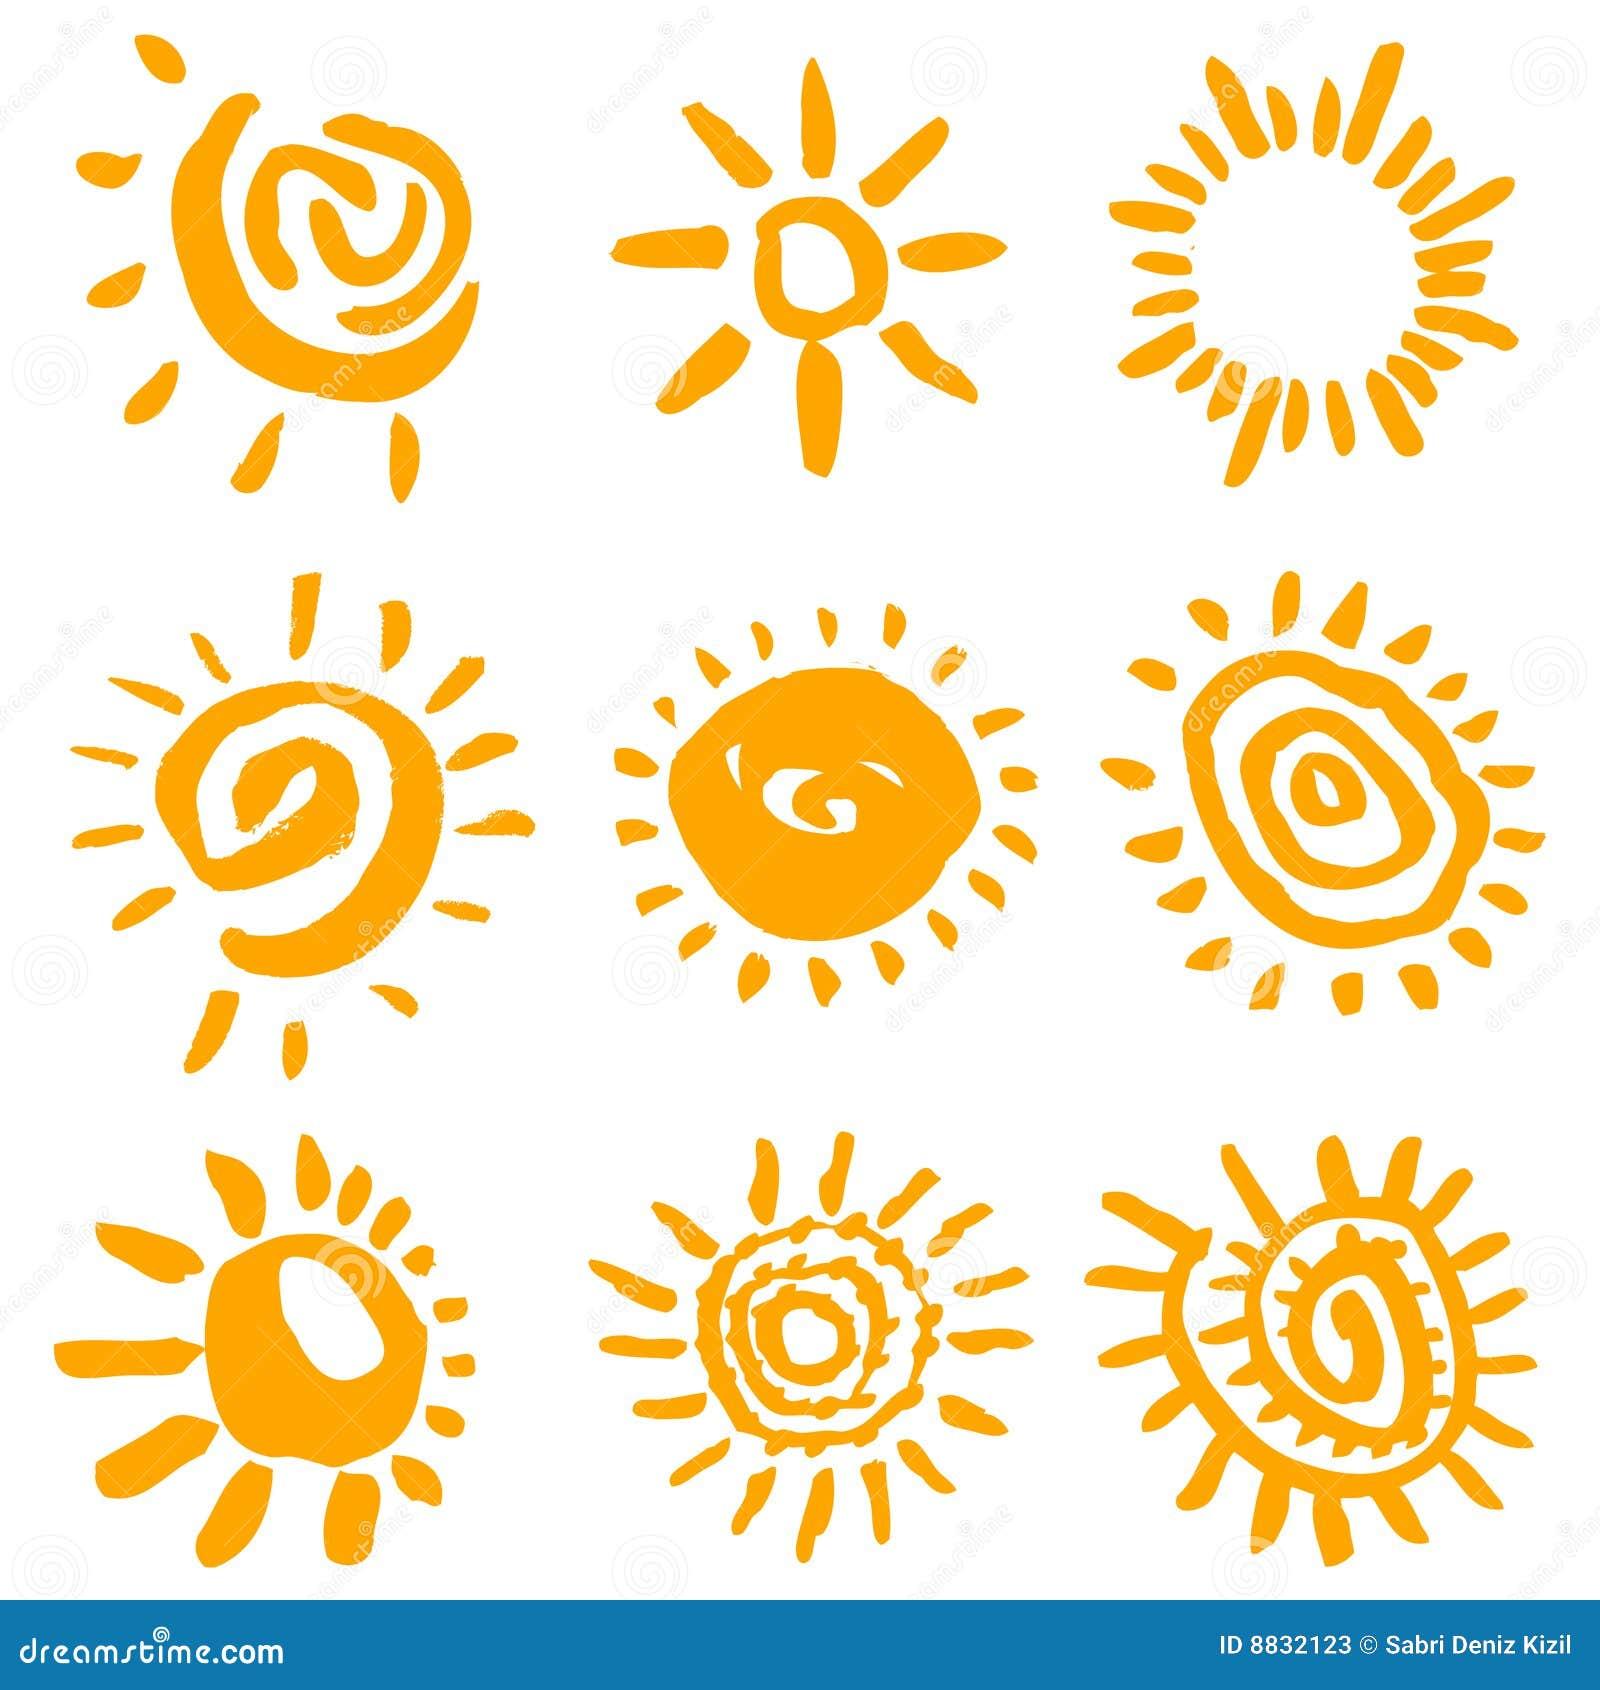 Sun symbols vector stock vector. Image of burst, element